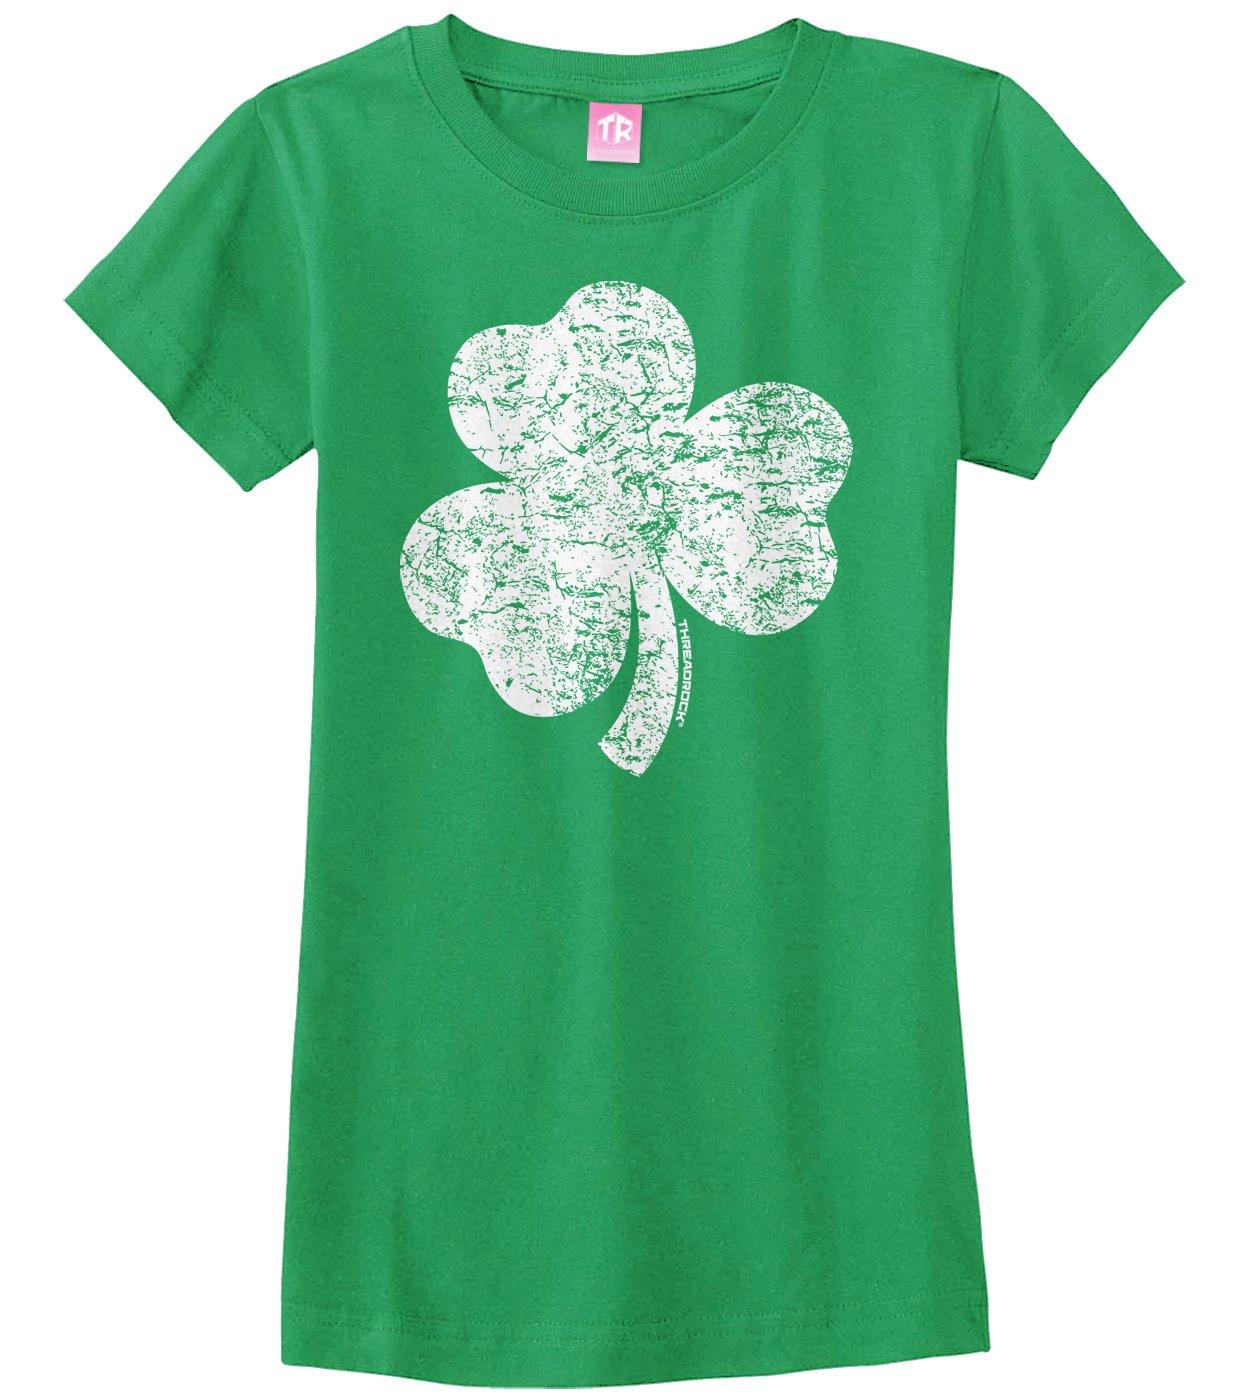 Big Girls Distressed Shamrock Ted T Shirt